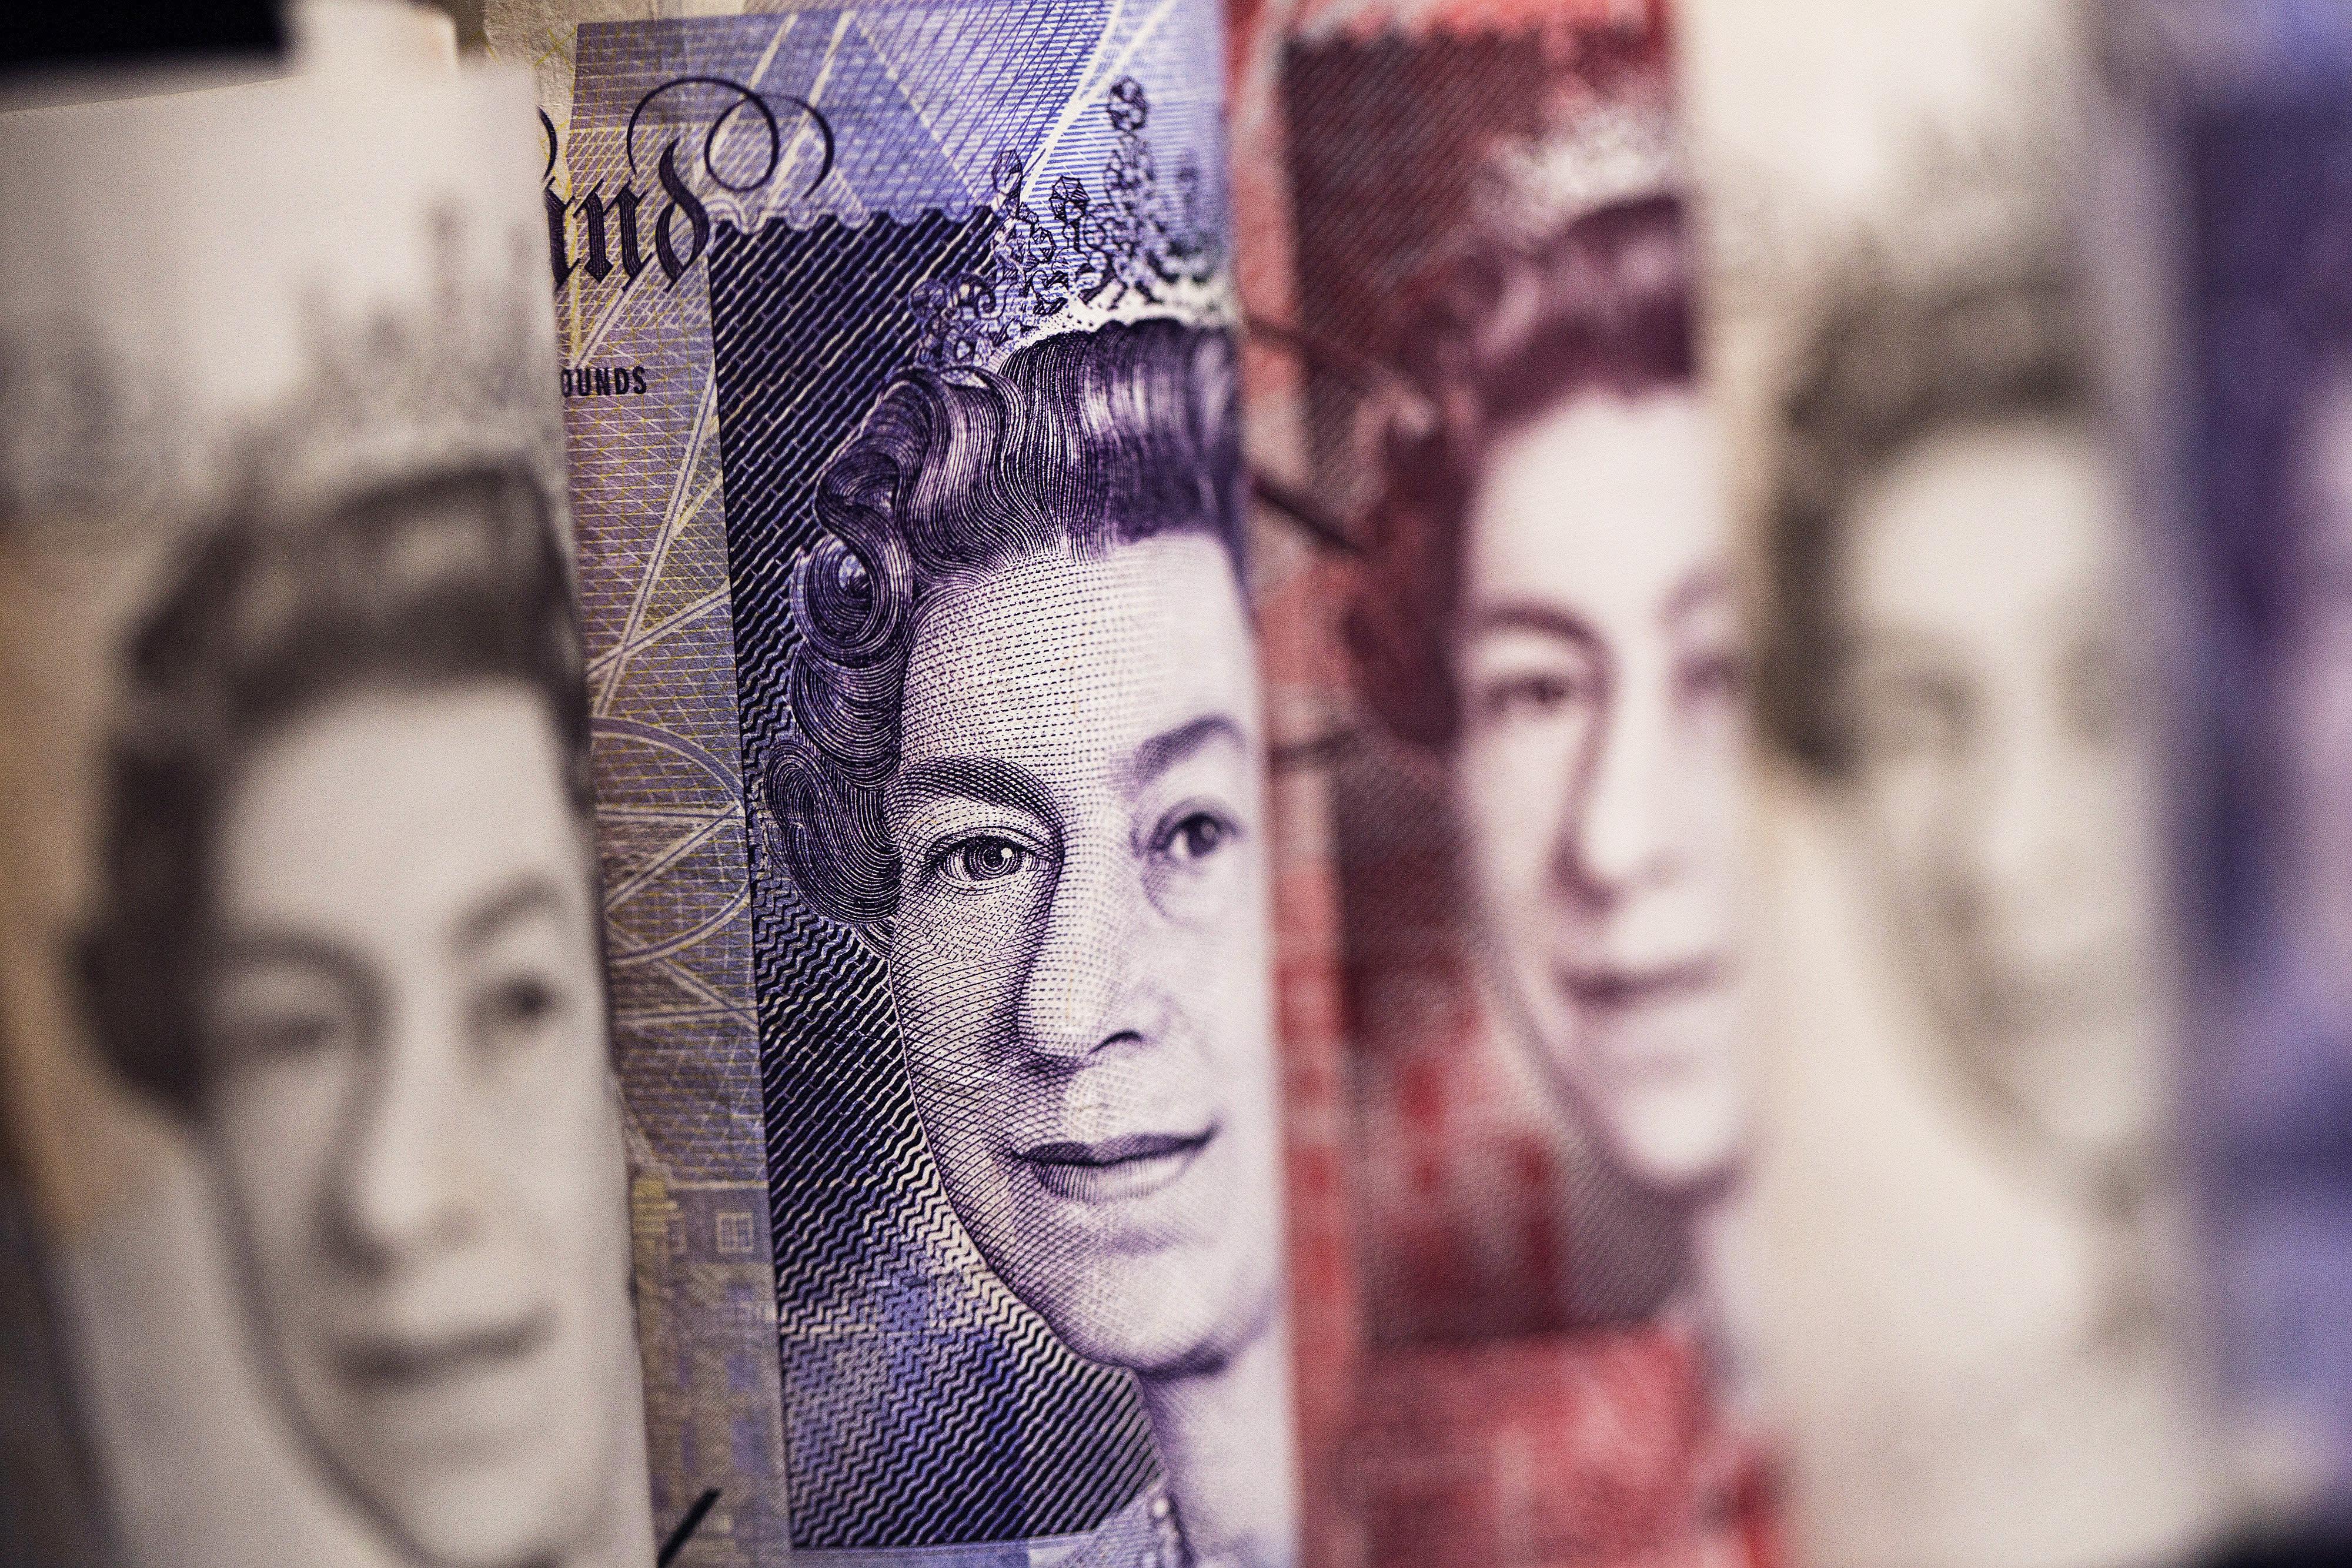 Third govt body stung by multi-million pound IR35 tax liability